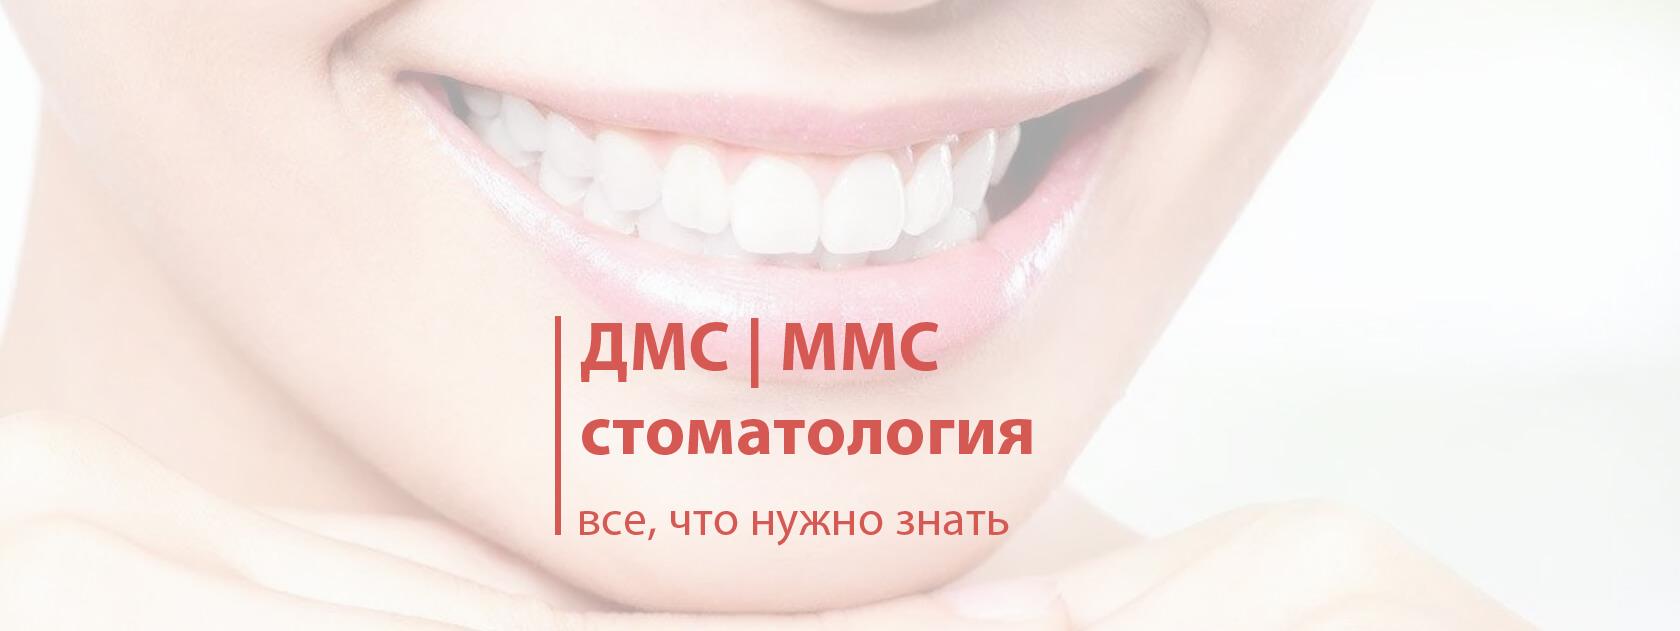 ДМС ММС Стоматология